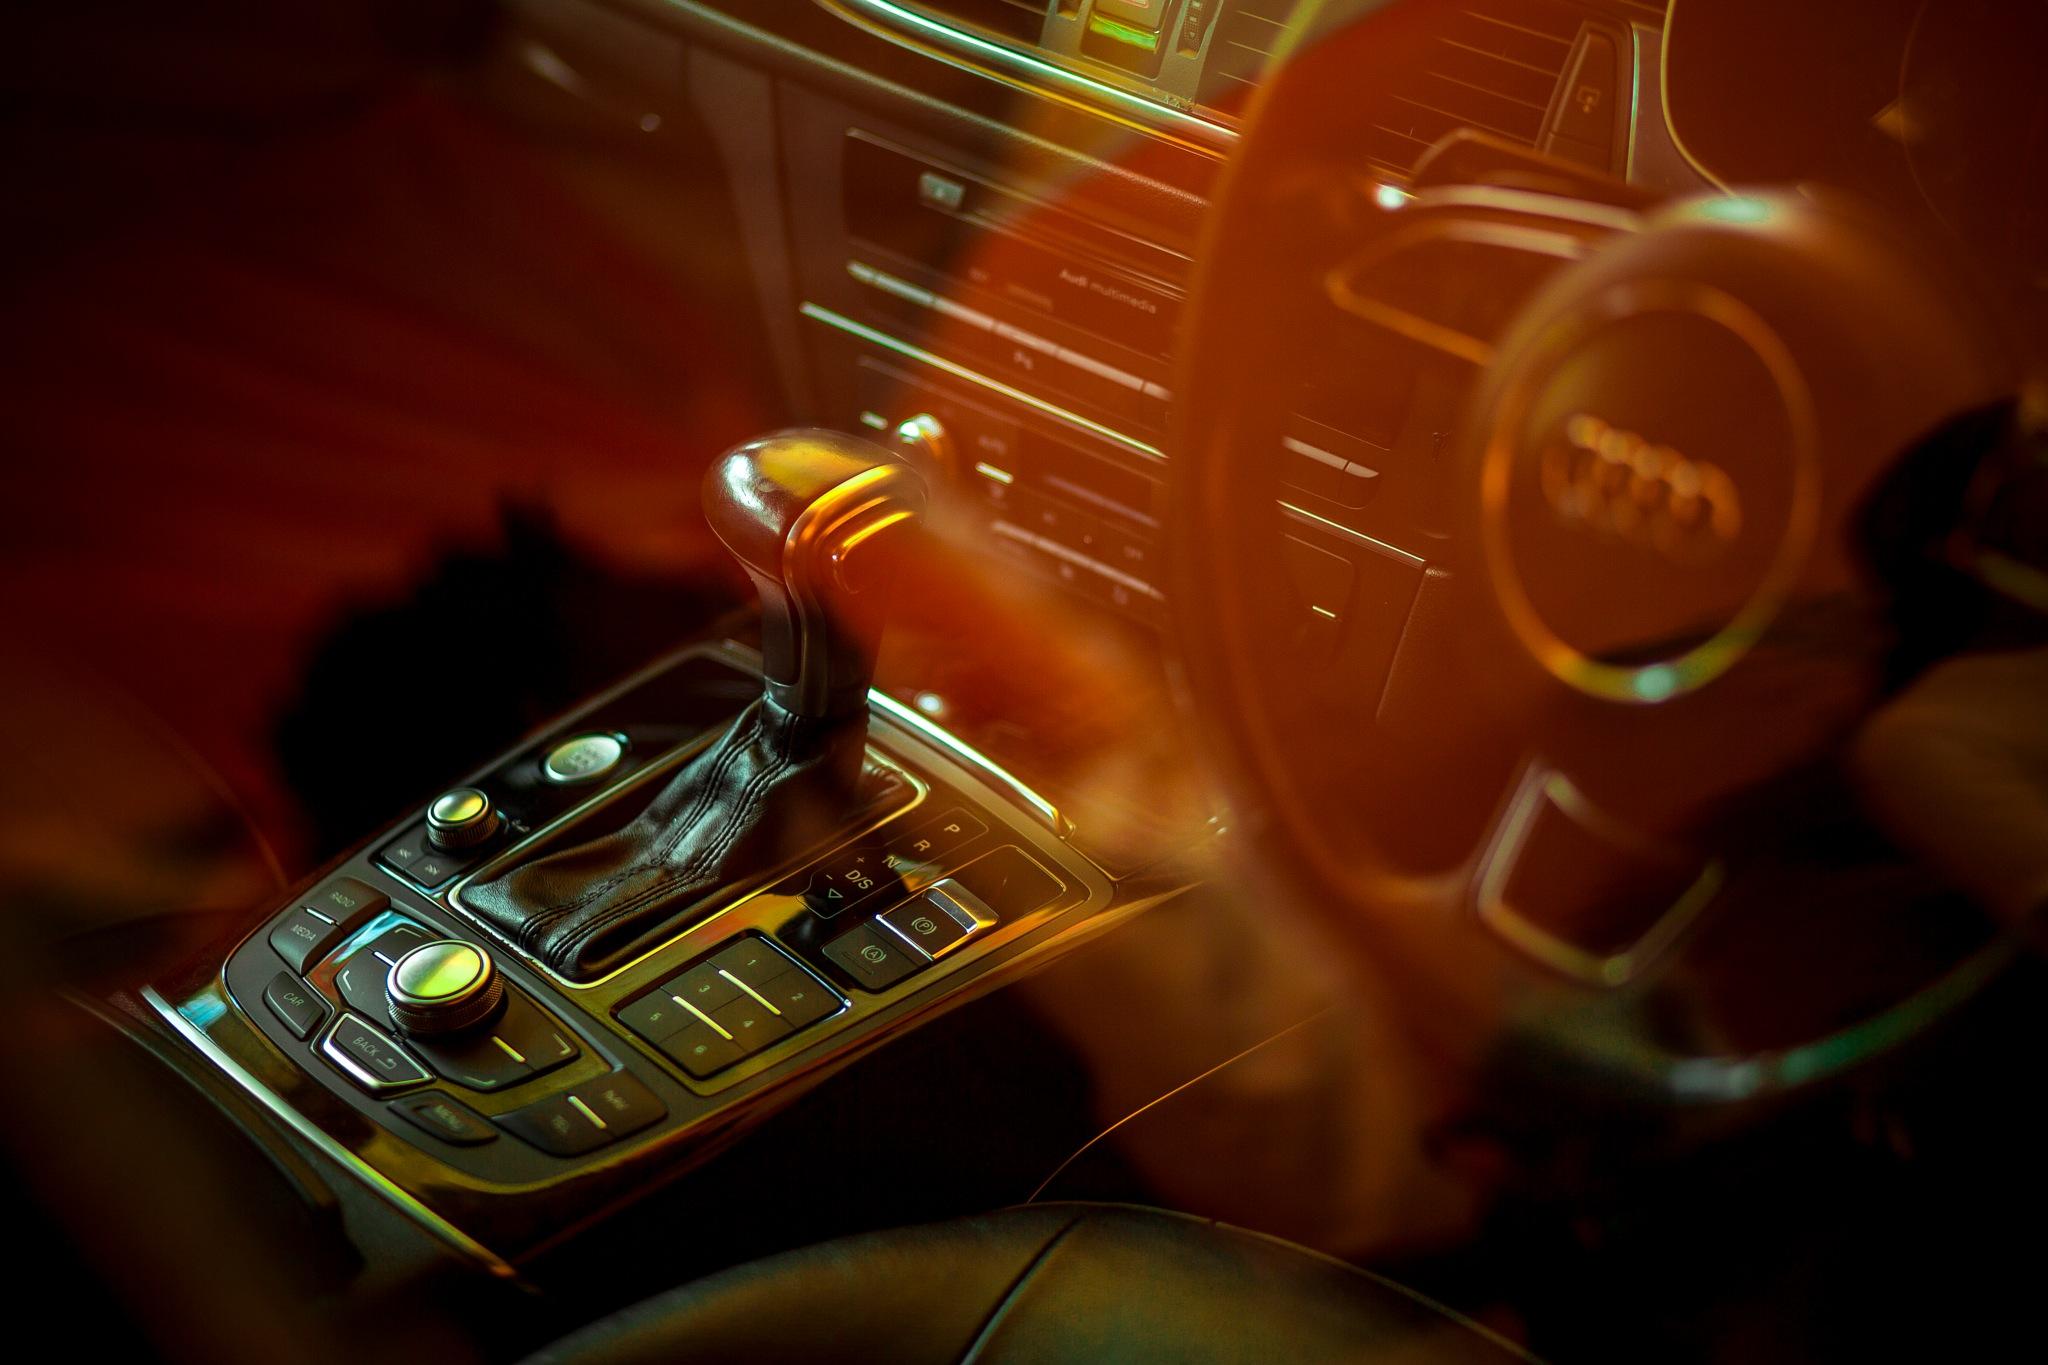 The Wedding Car by Kevin Benny